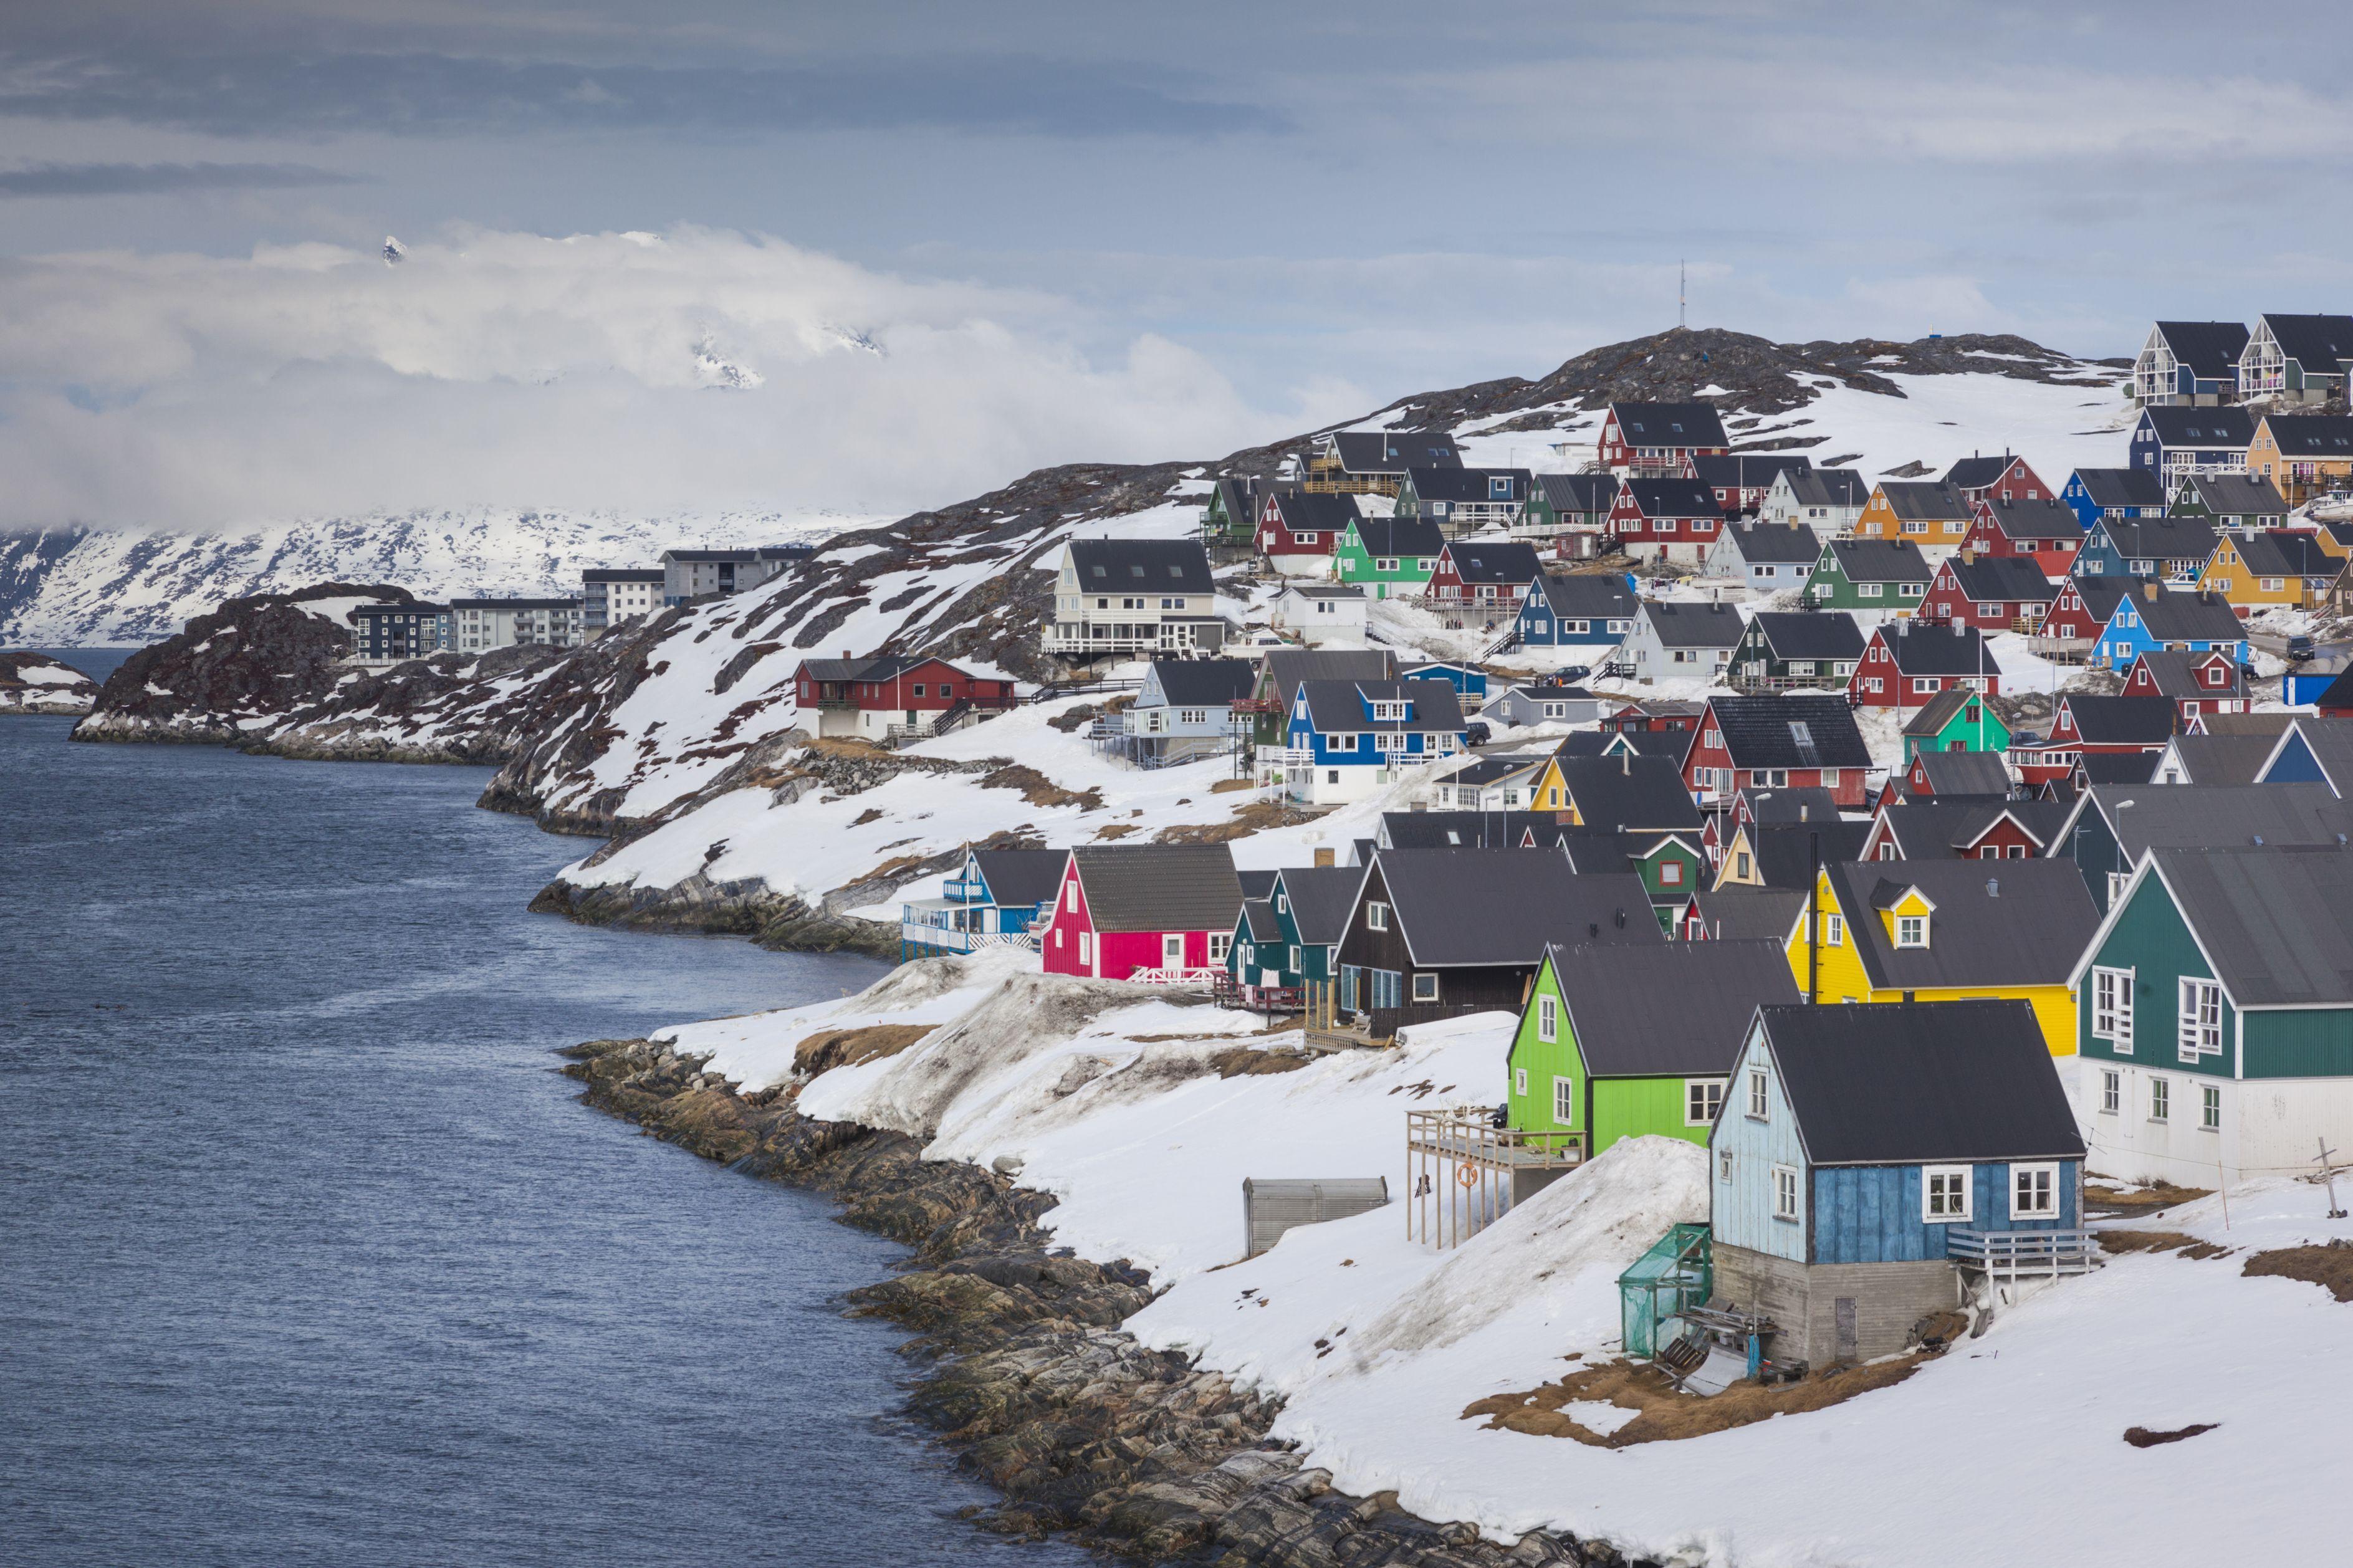 Trump amerikai konzulátust nyitna Grönlandon